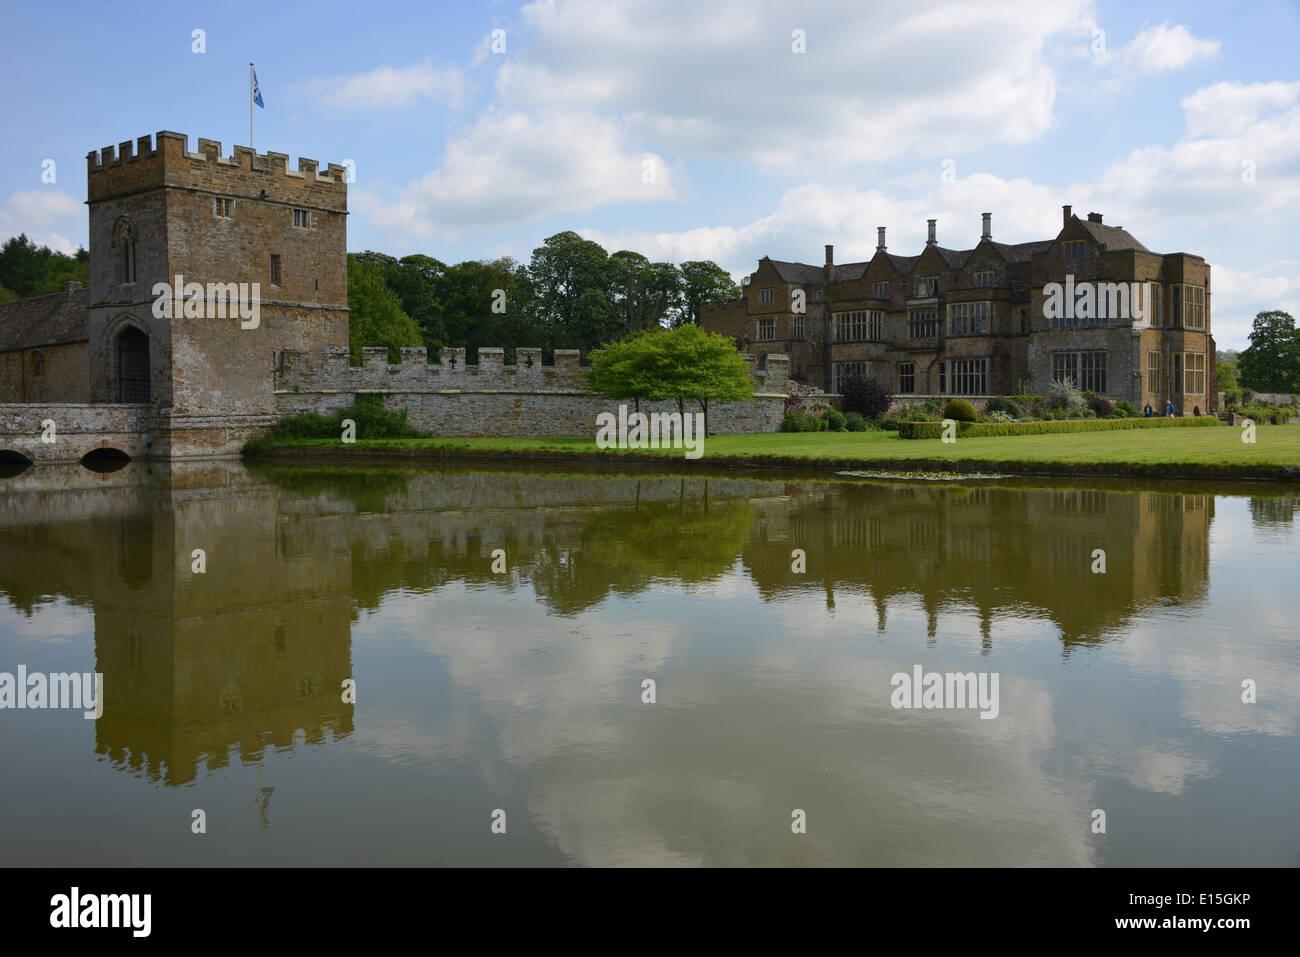 Broughton Castle near Banbury, Oxfordshire - Stock Image